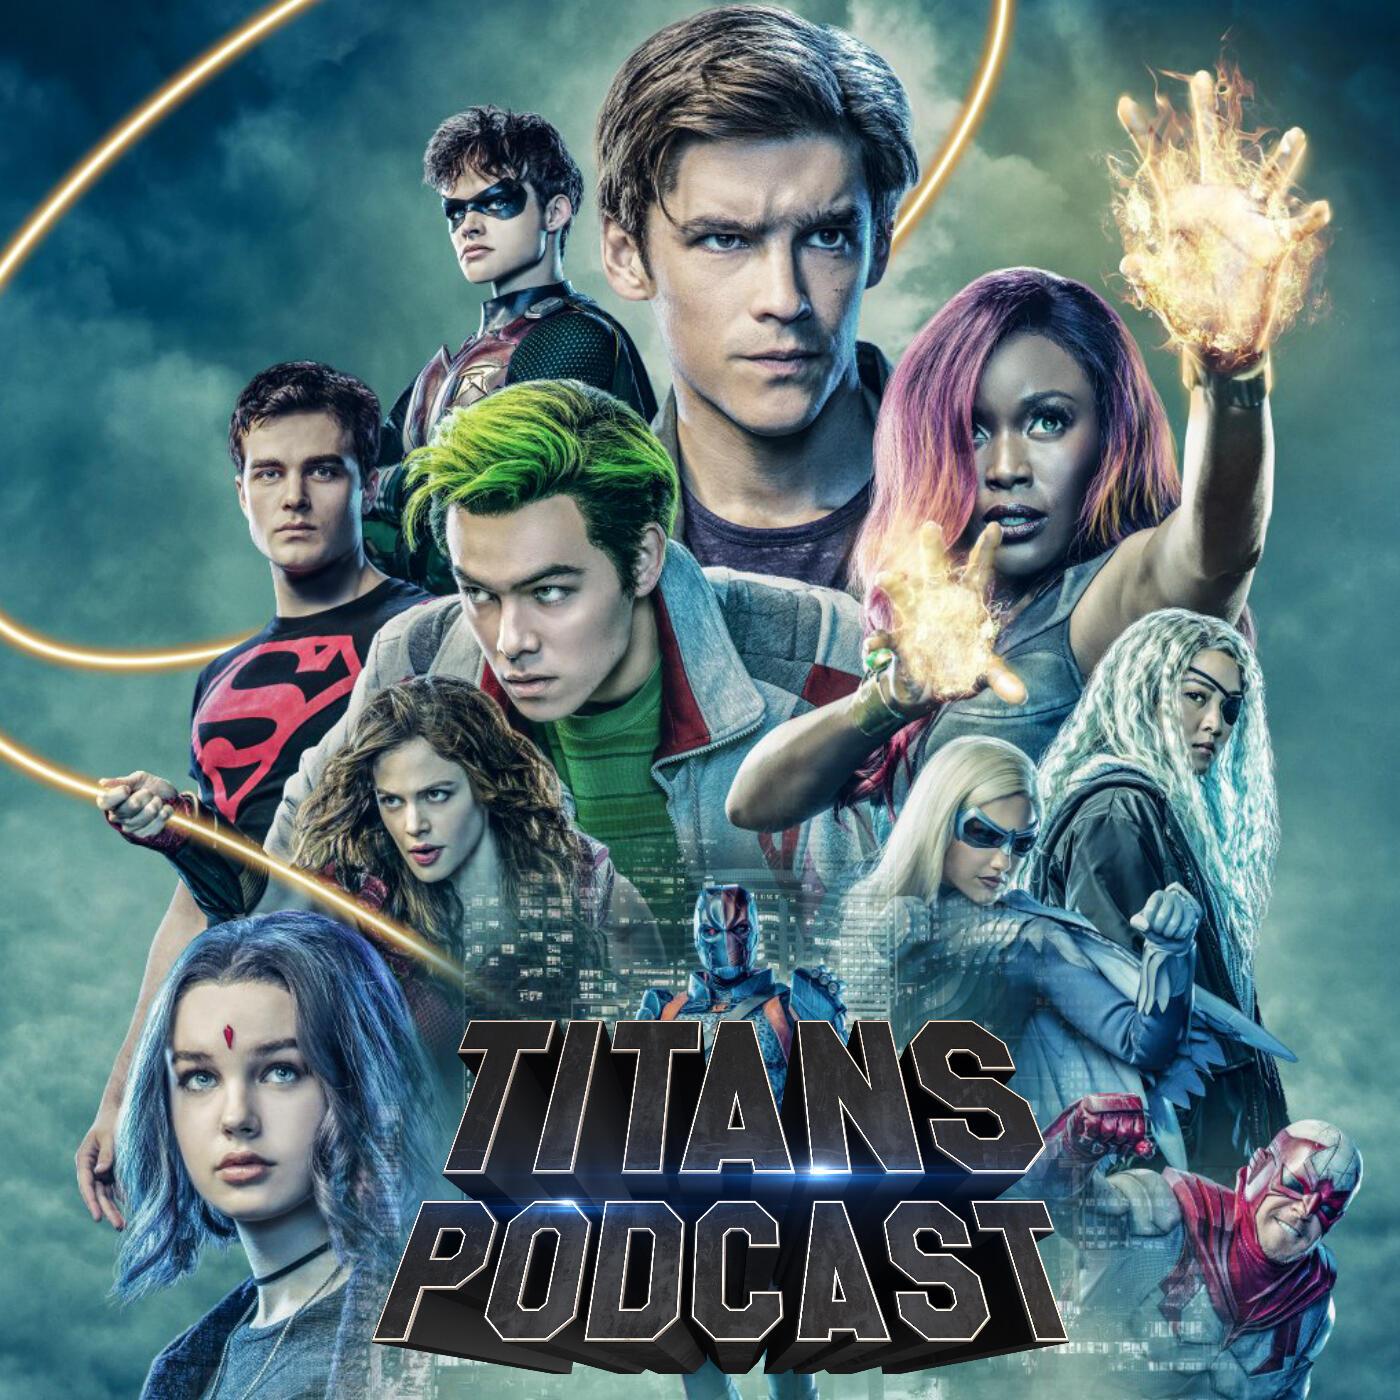 Titans Podcast